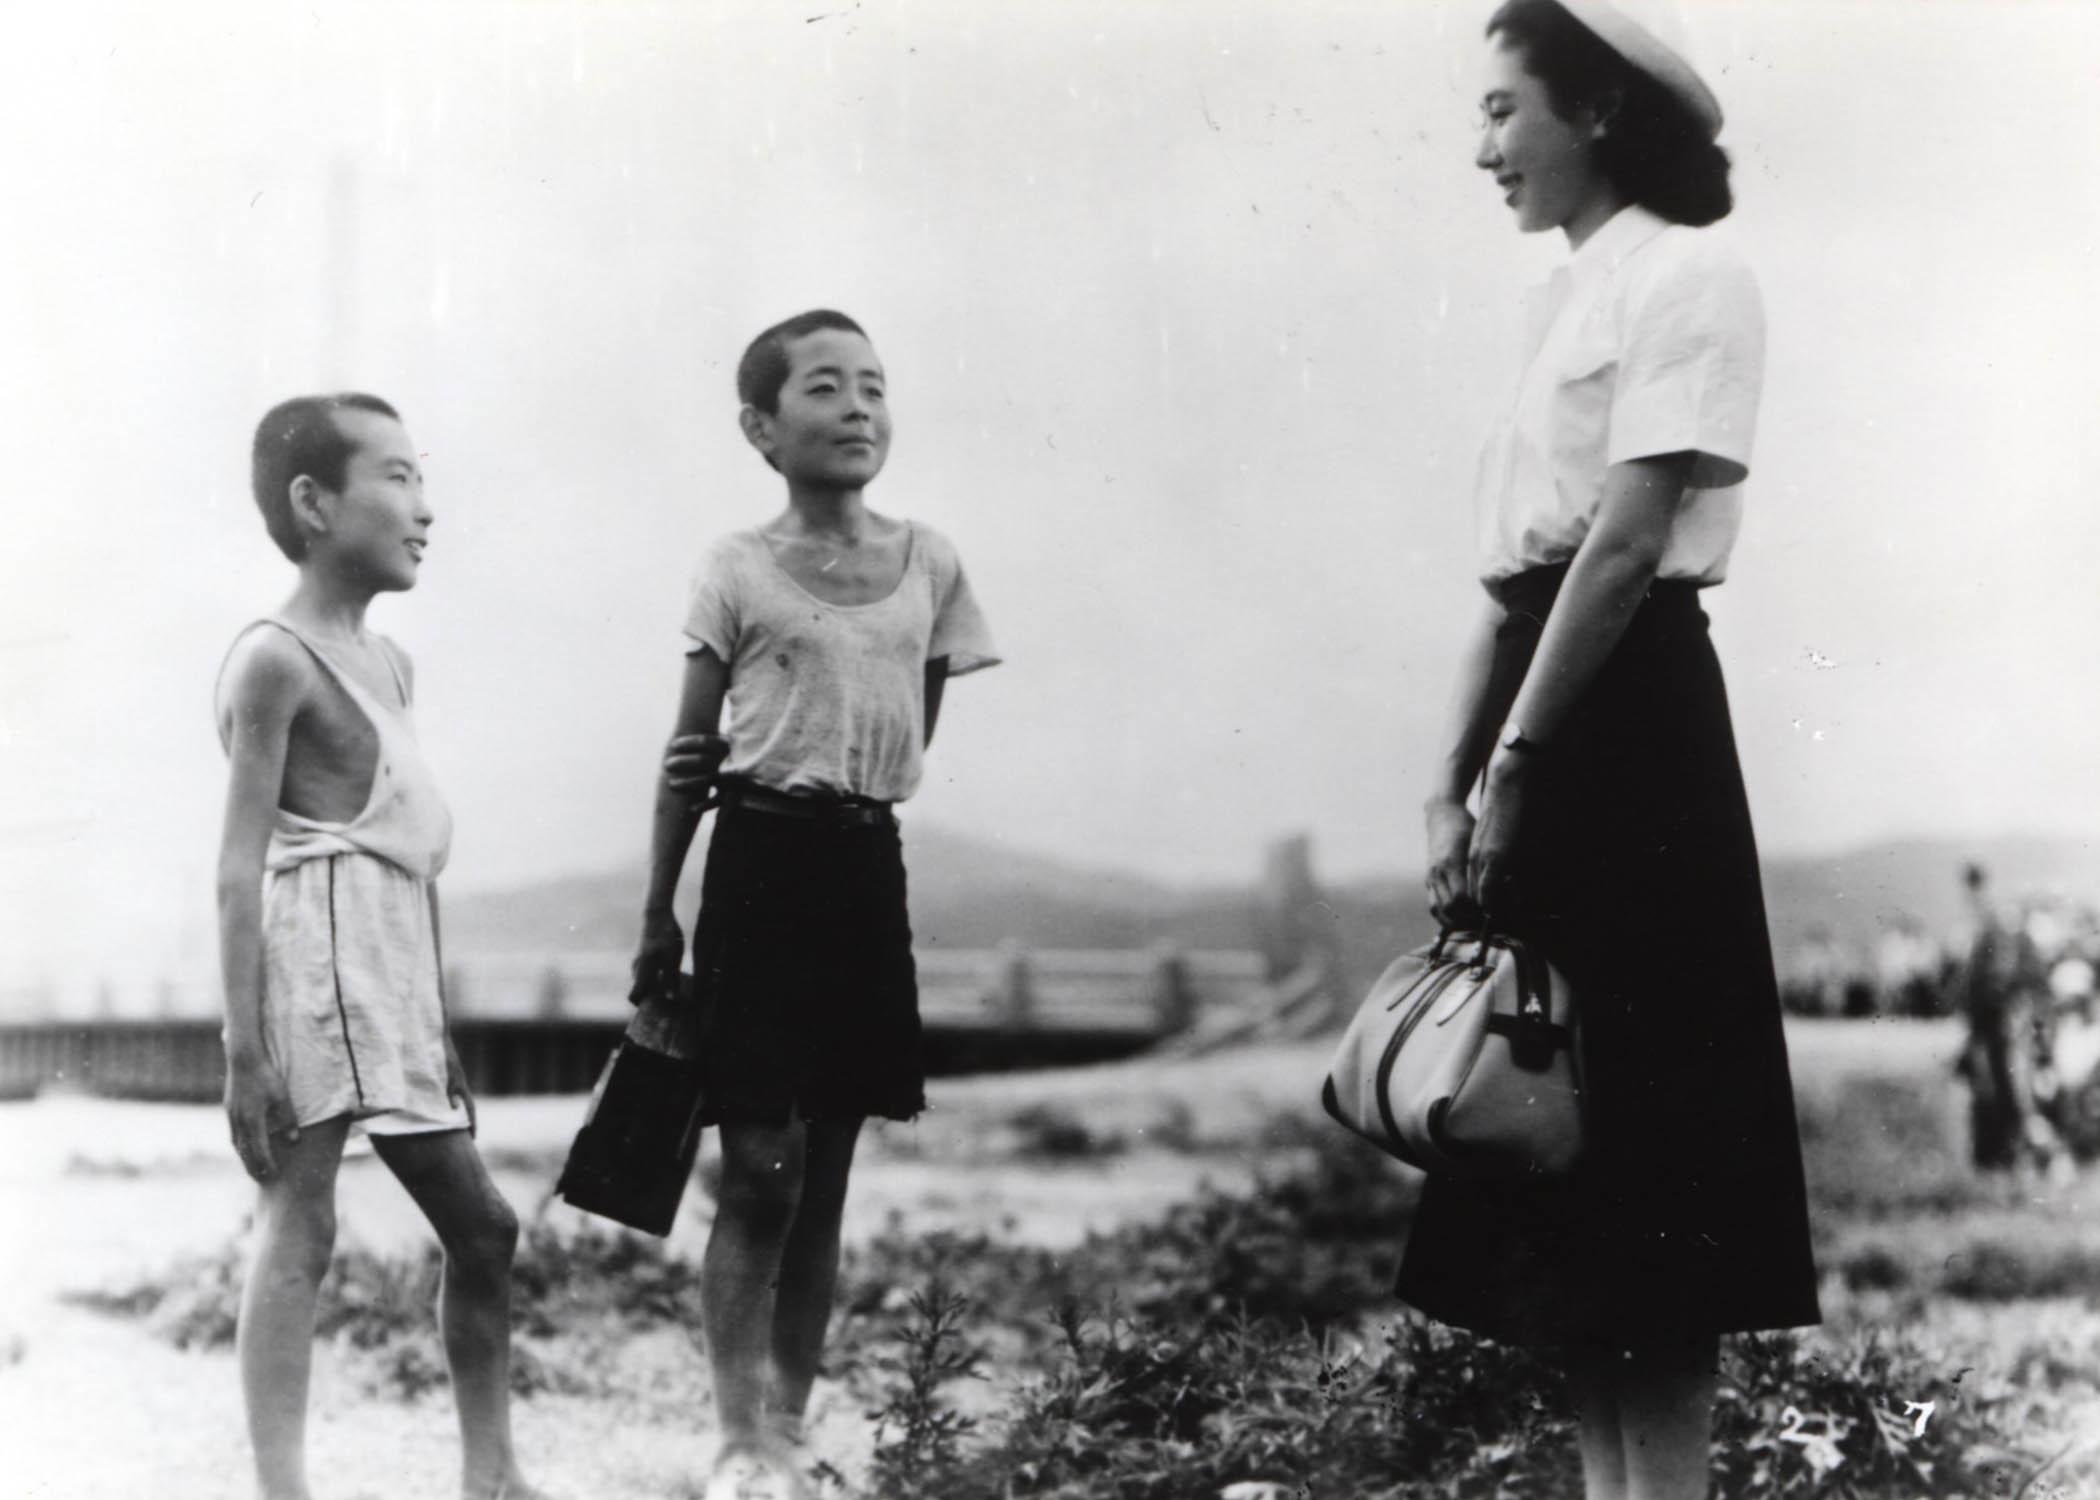 Kaneto Shindō's Children of Hiroshima at BAM